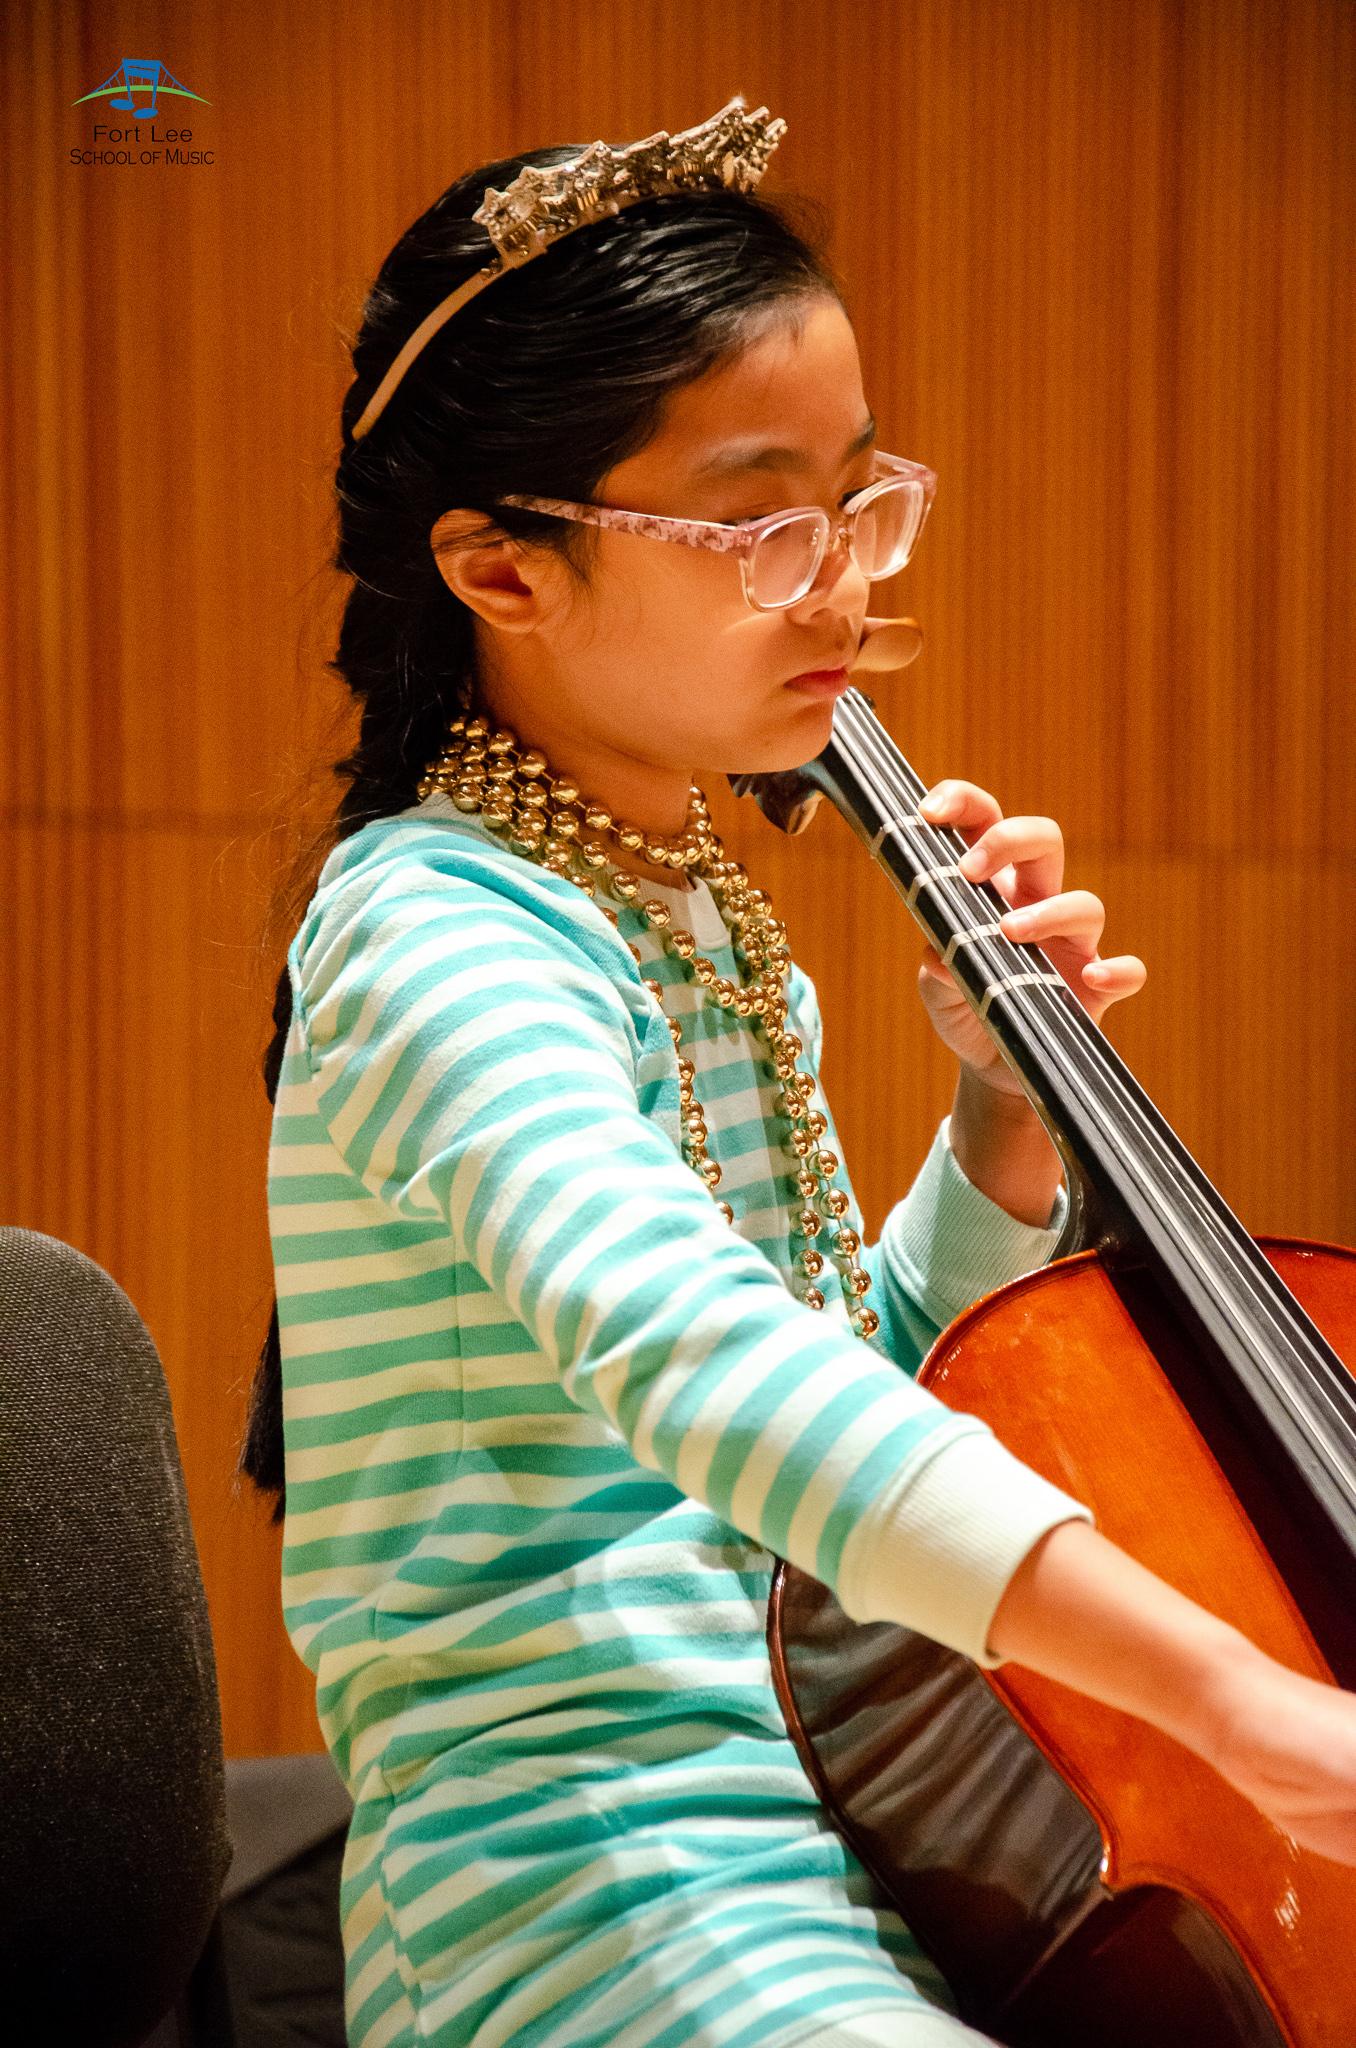 cello-lessons-near-me.jpg